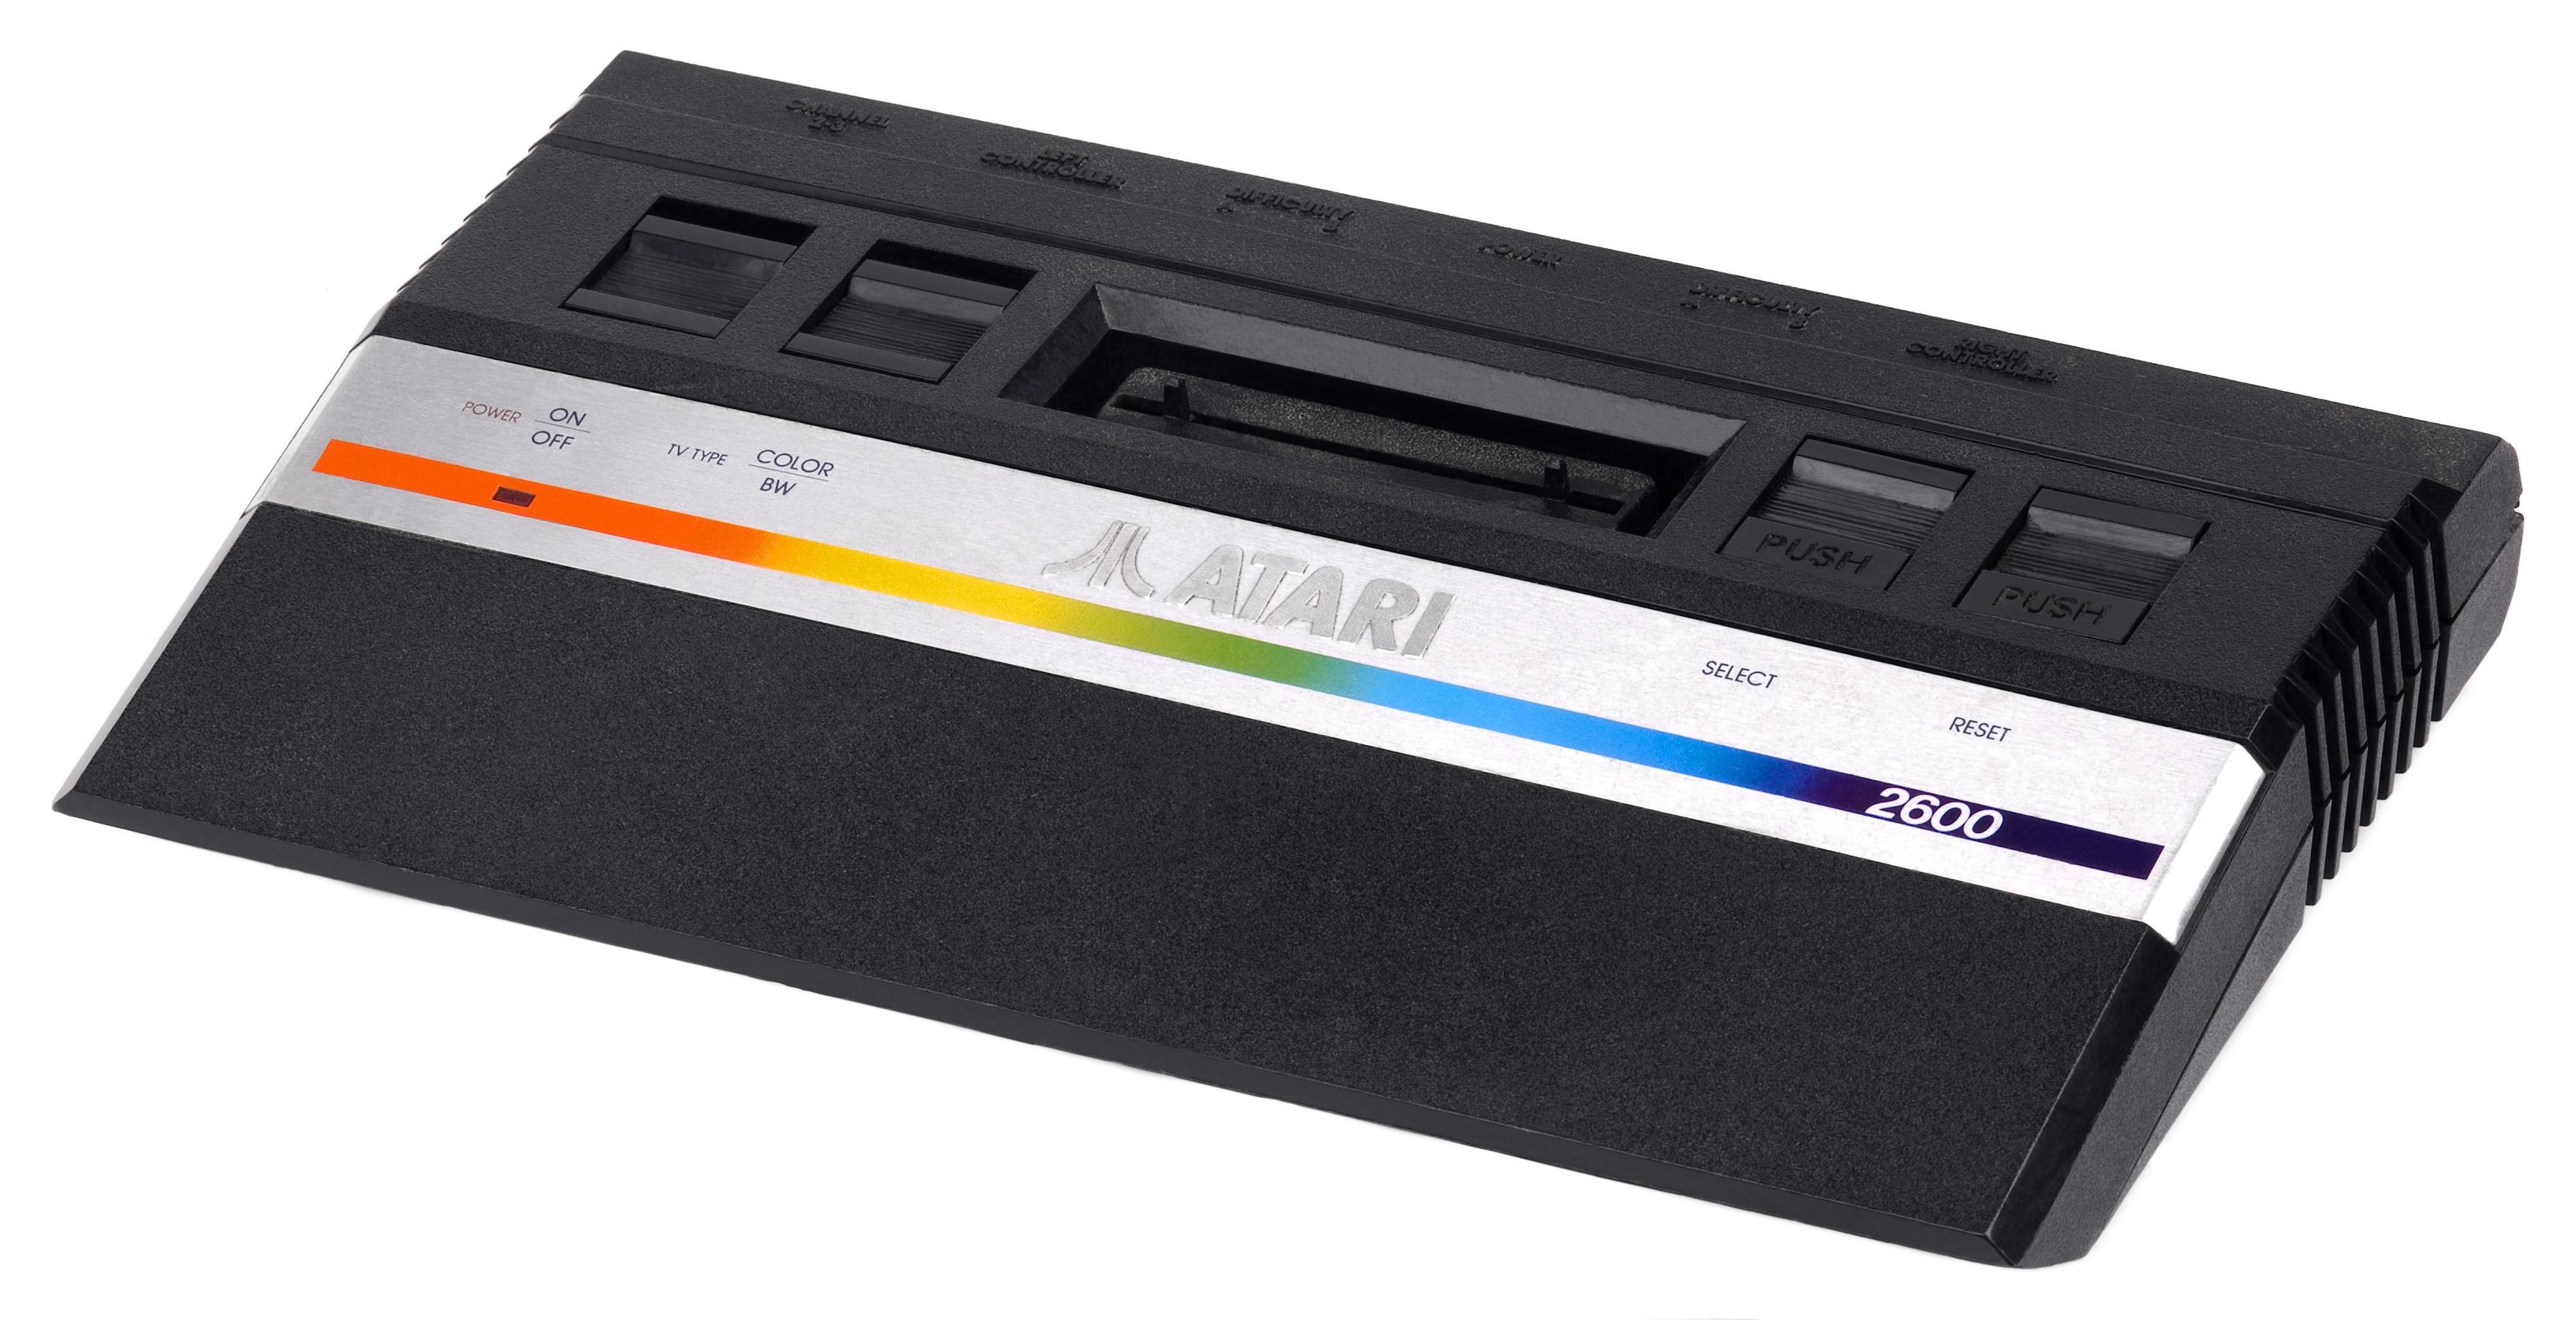 Atari 2600 jr hd wallpaper background image 4060x2080 id 379970 wallpaper abyss - Original atari game console ...